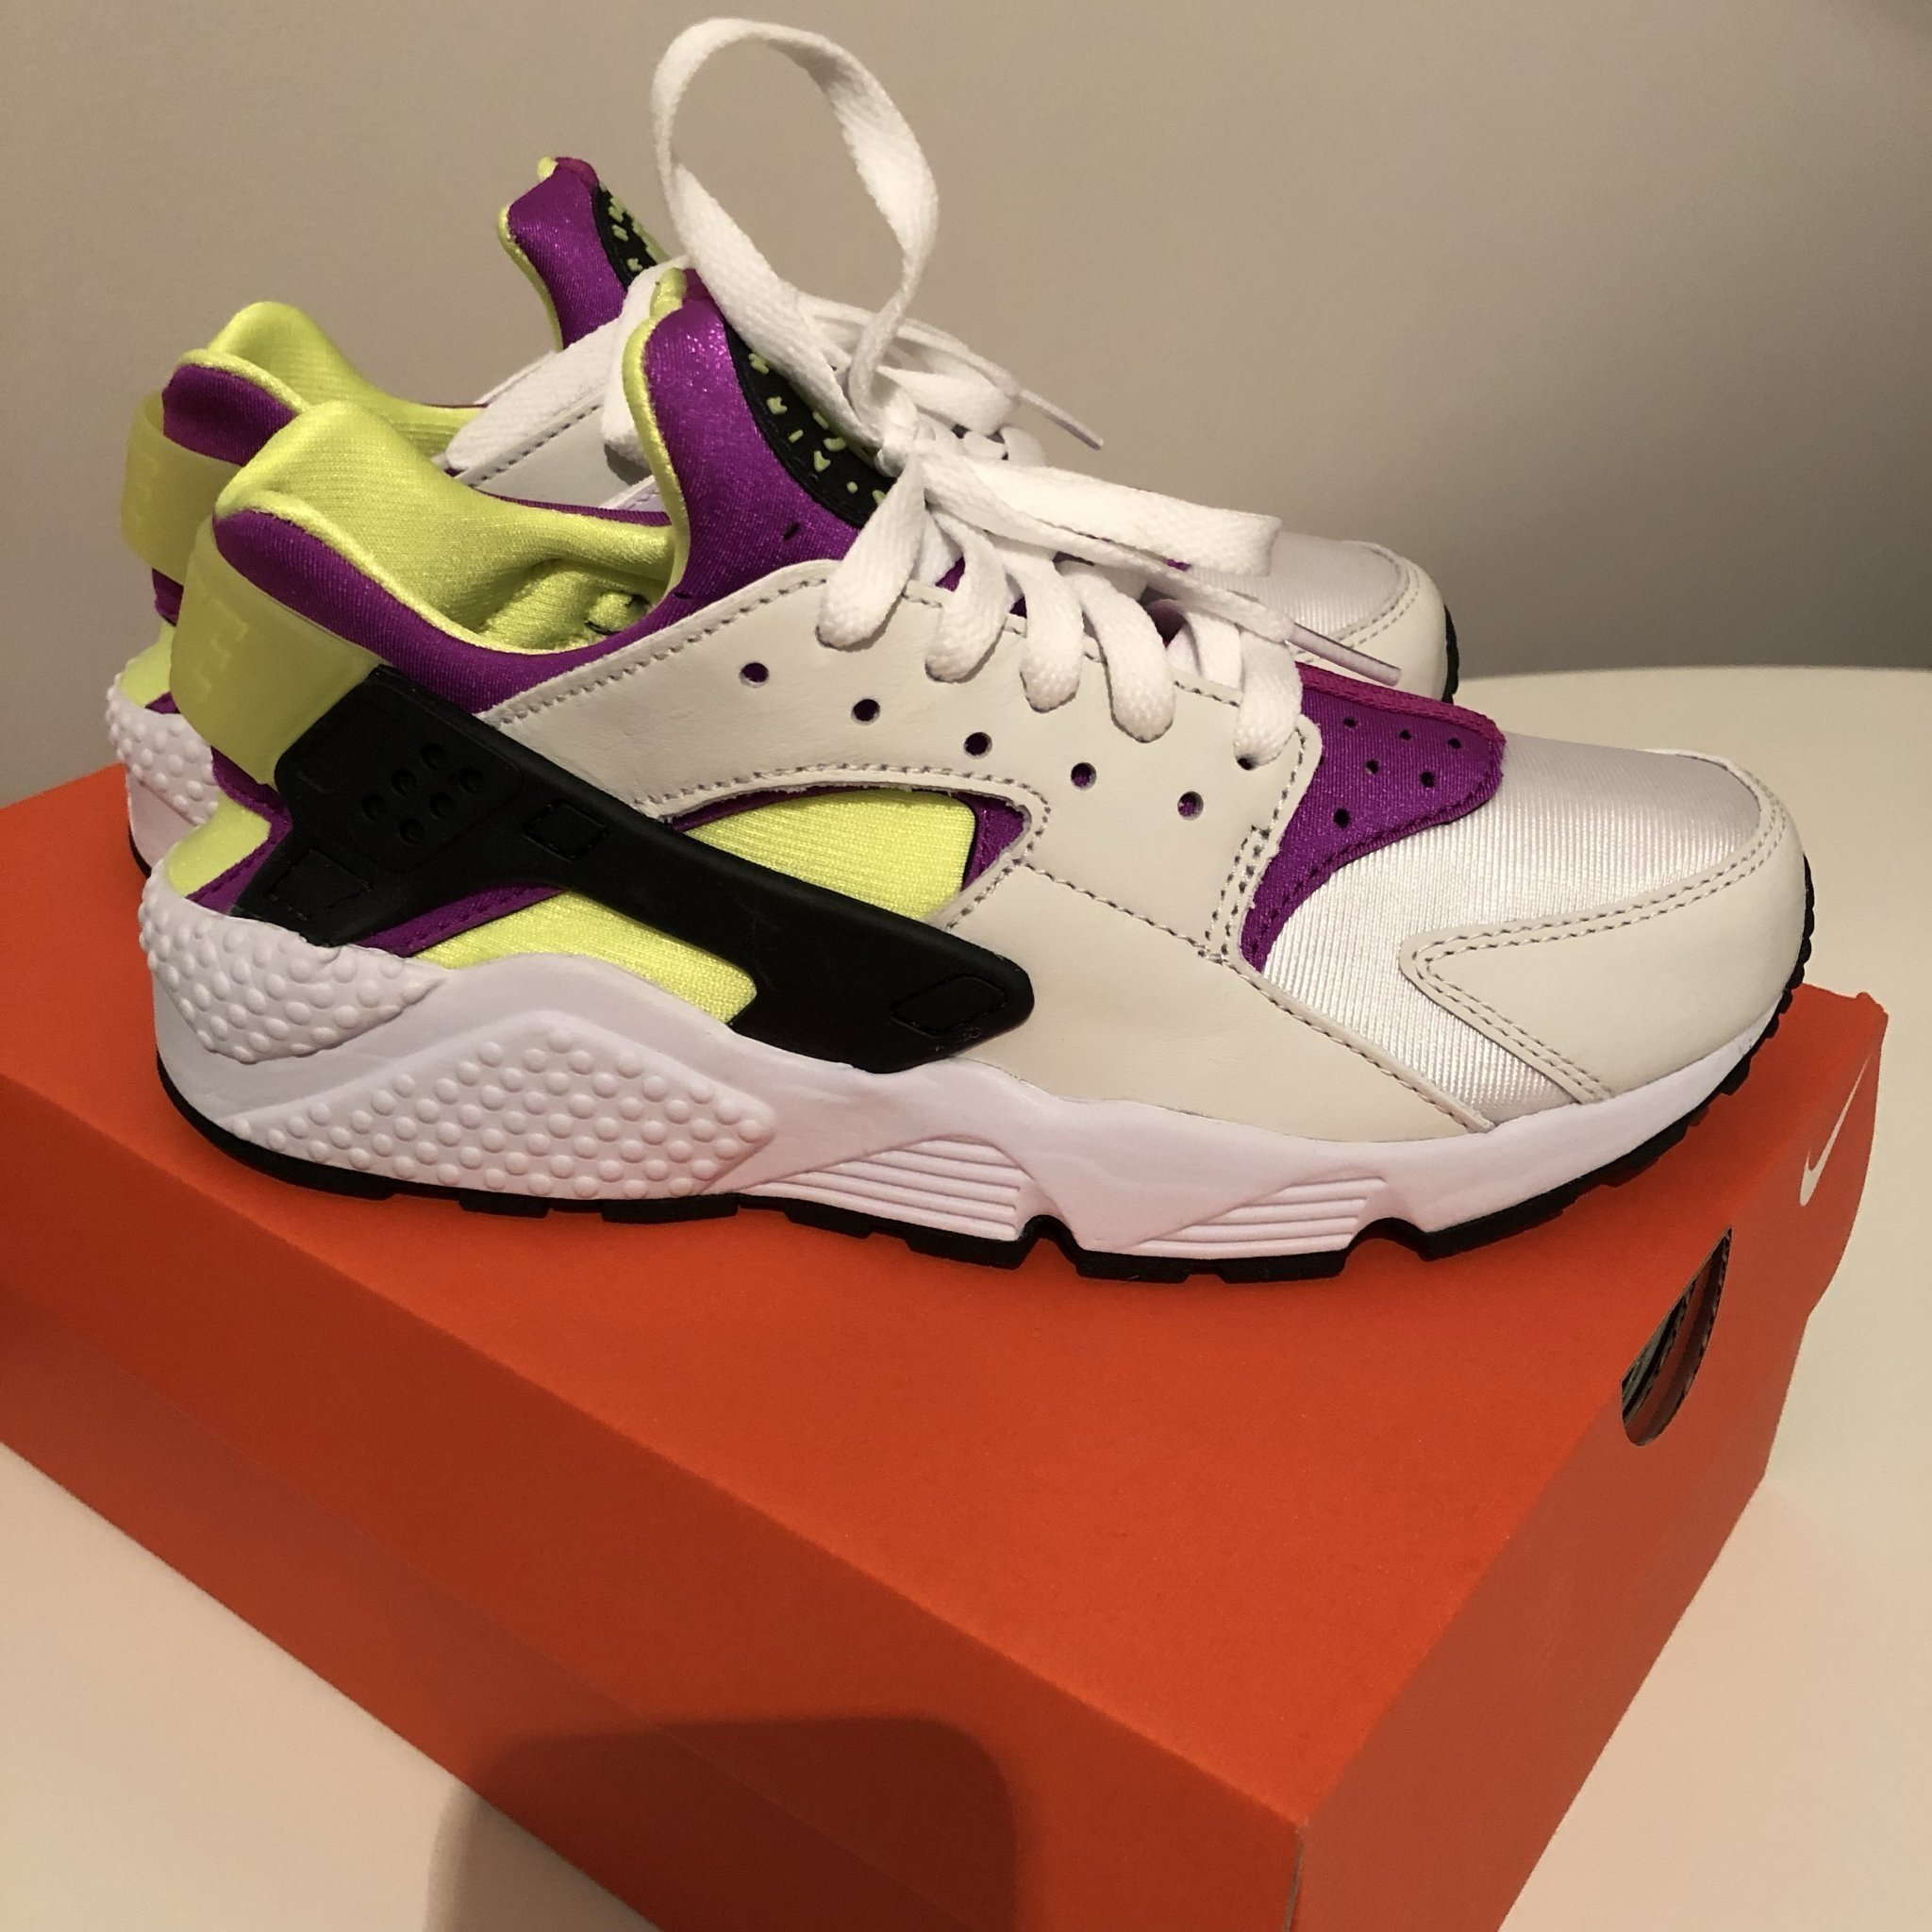 new style b0da6 a657a Nike Huarache 38,5 Nya i kartong! (350645422) ᐈ Köp på Tradera